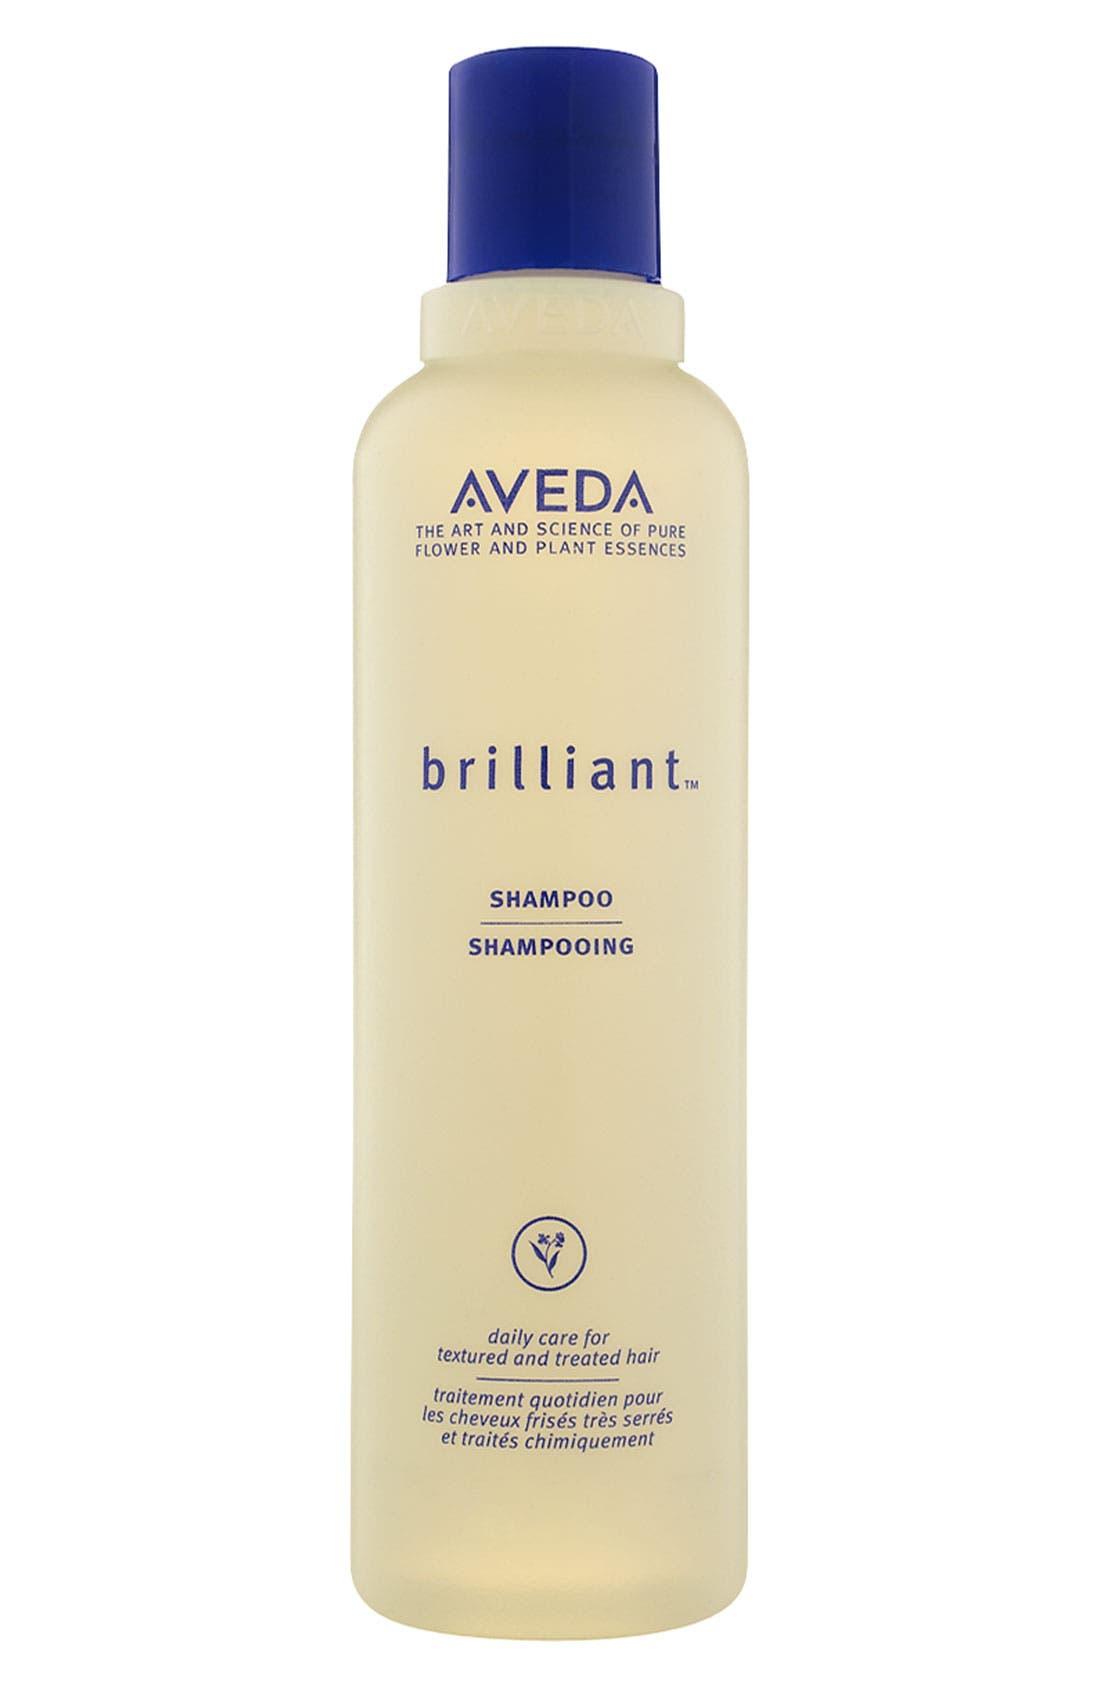 Aveda brilliant™ Shampoo